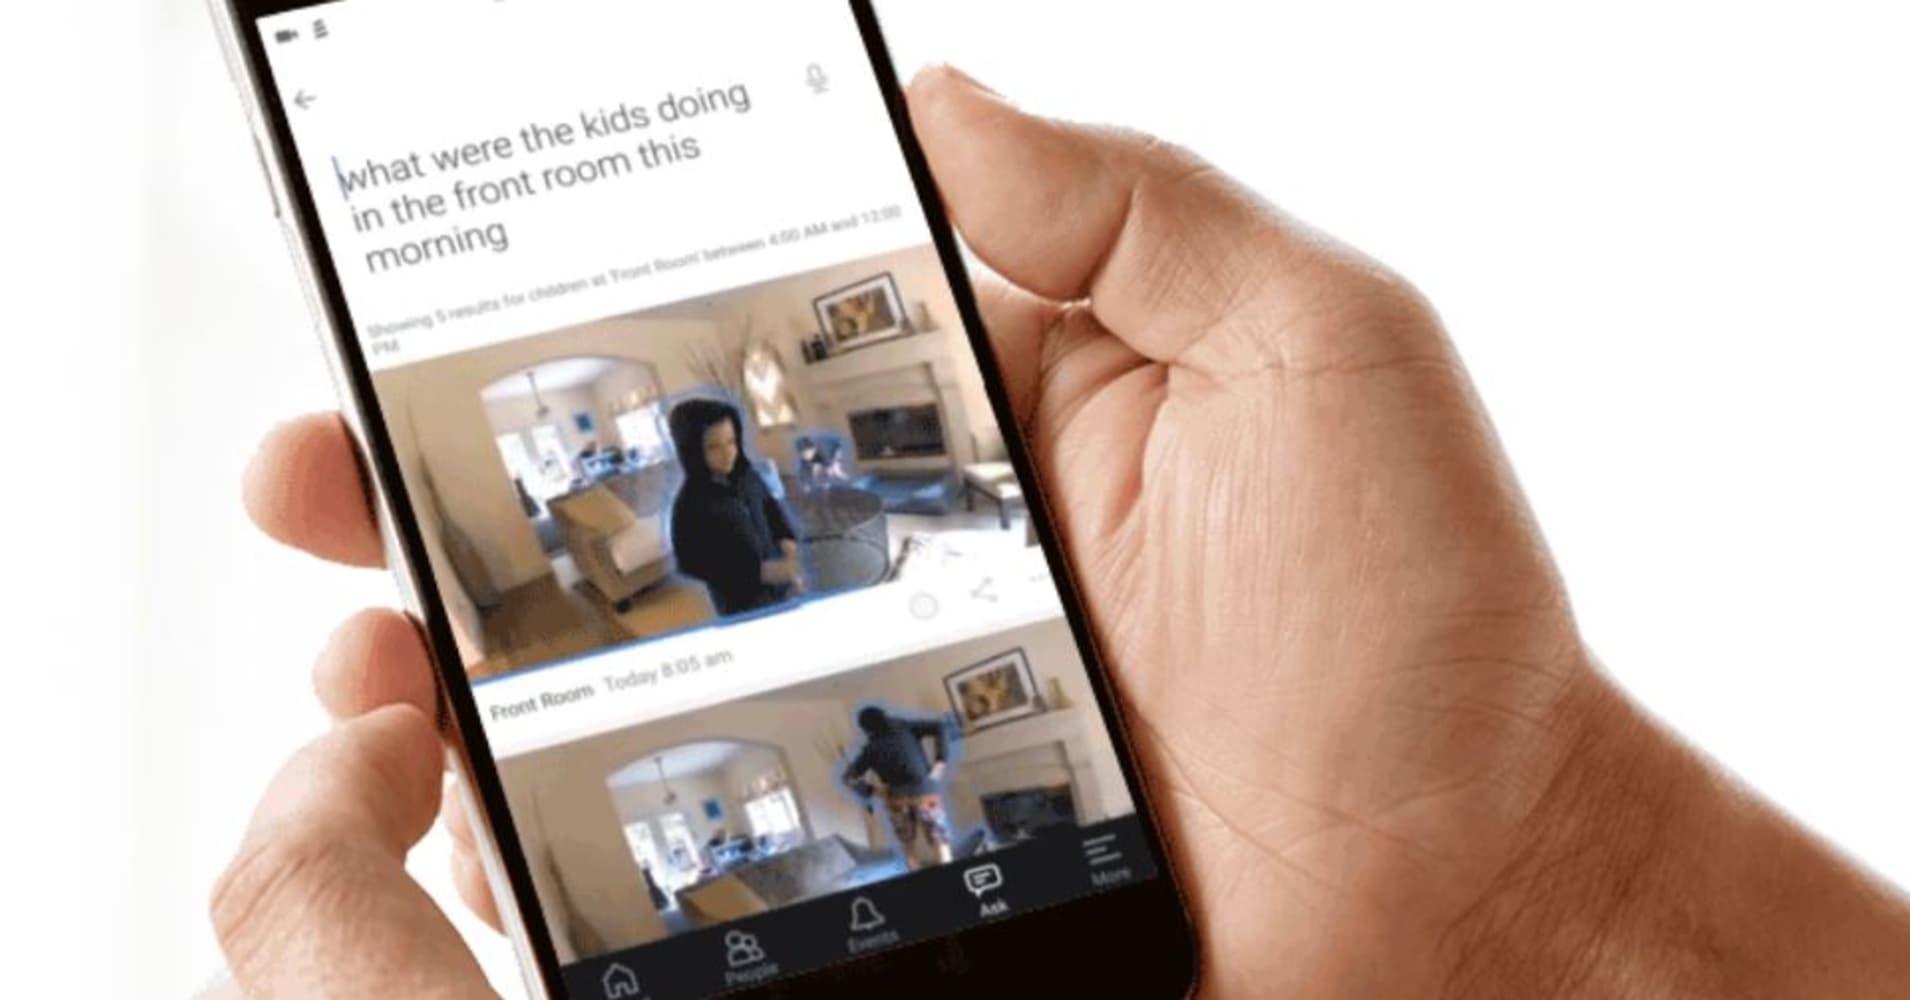 Kết quả hình ảnh cho Lighthouse review: a smarter security camera